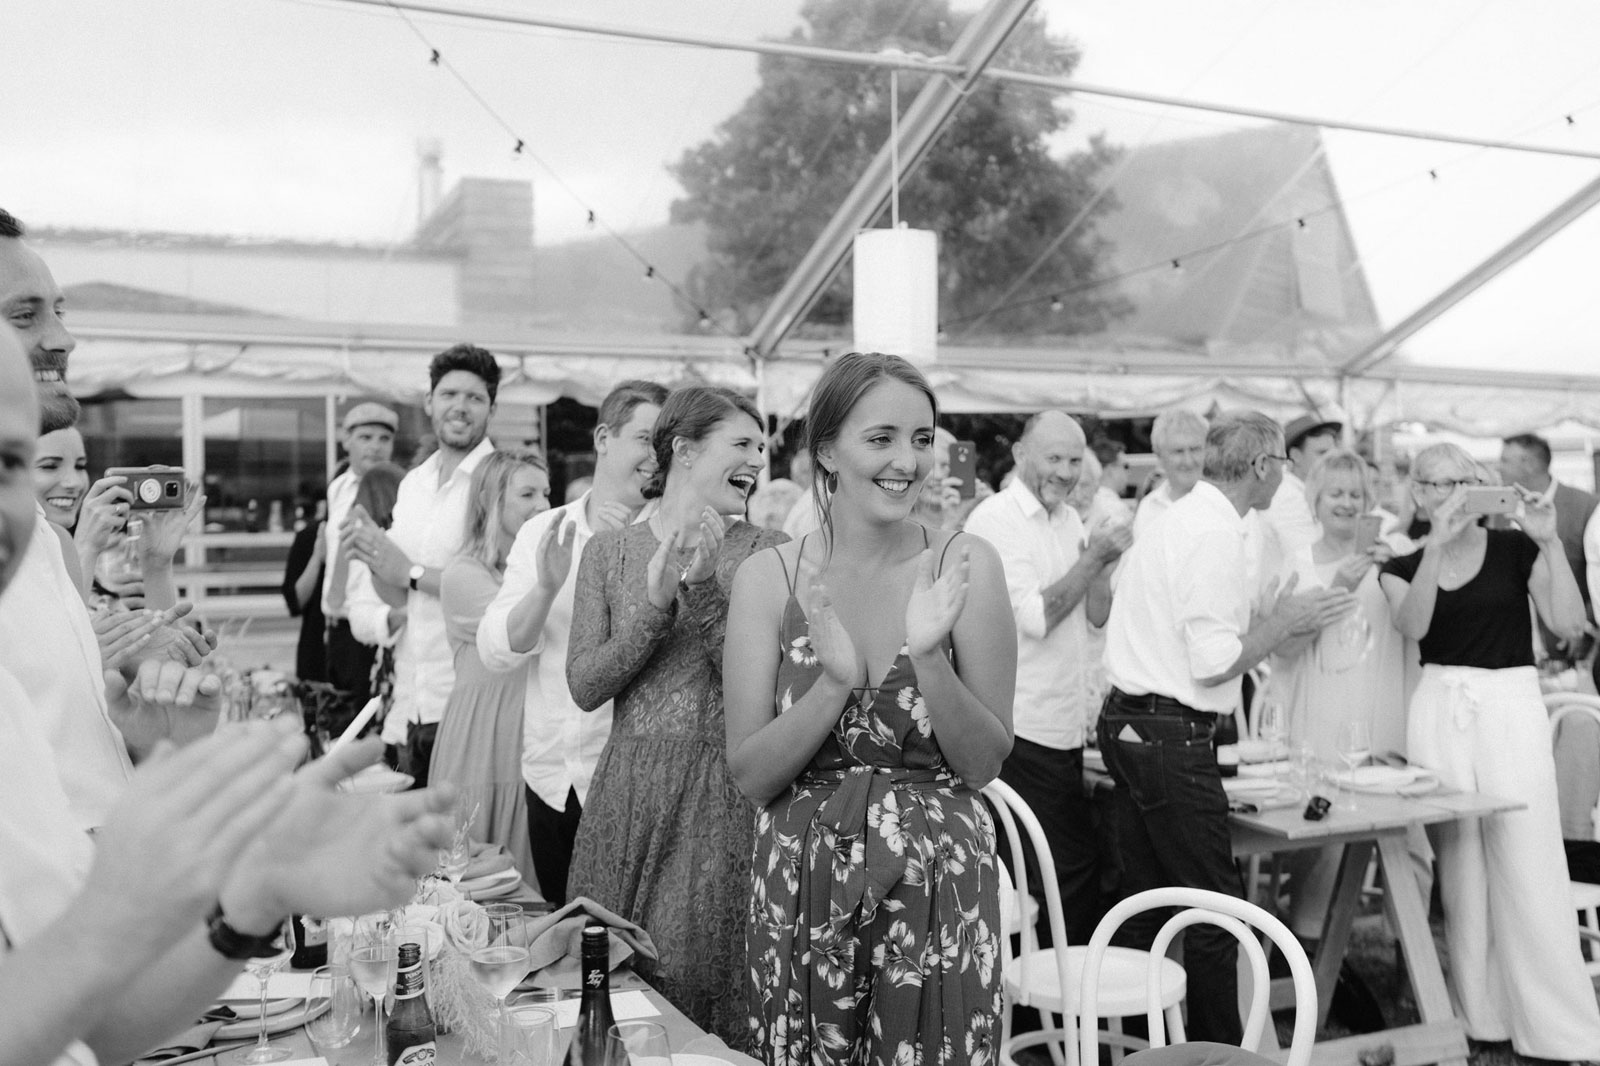 newfound-k-b-coromandel-wedding-photographers-103